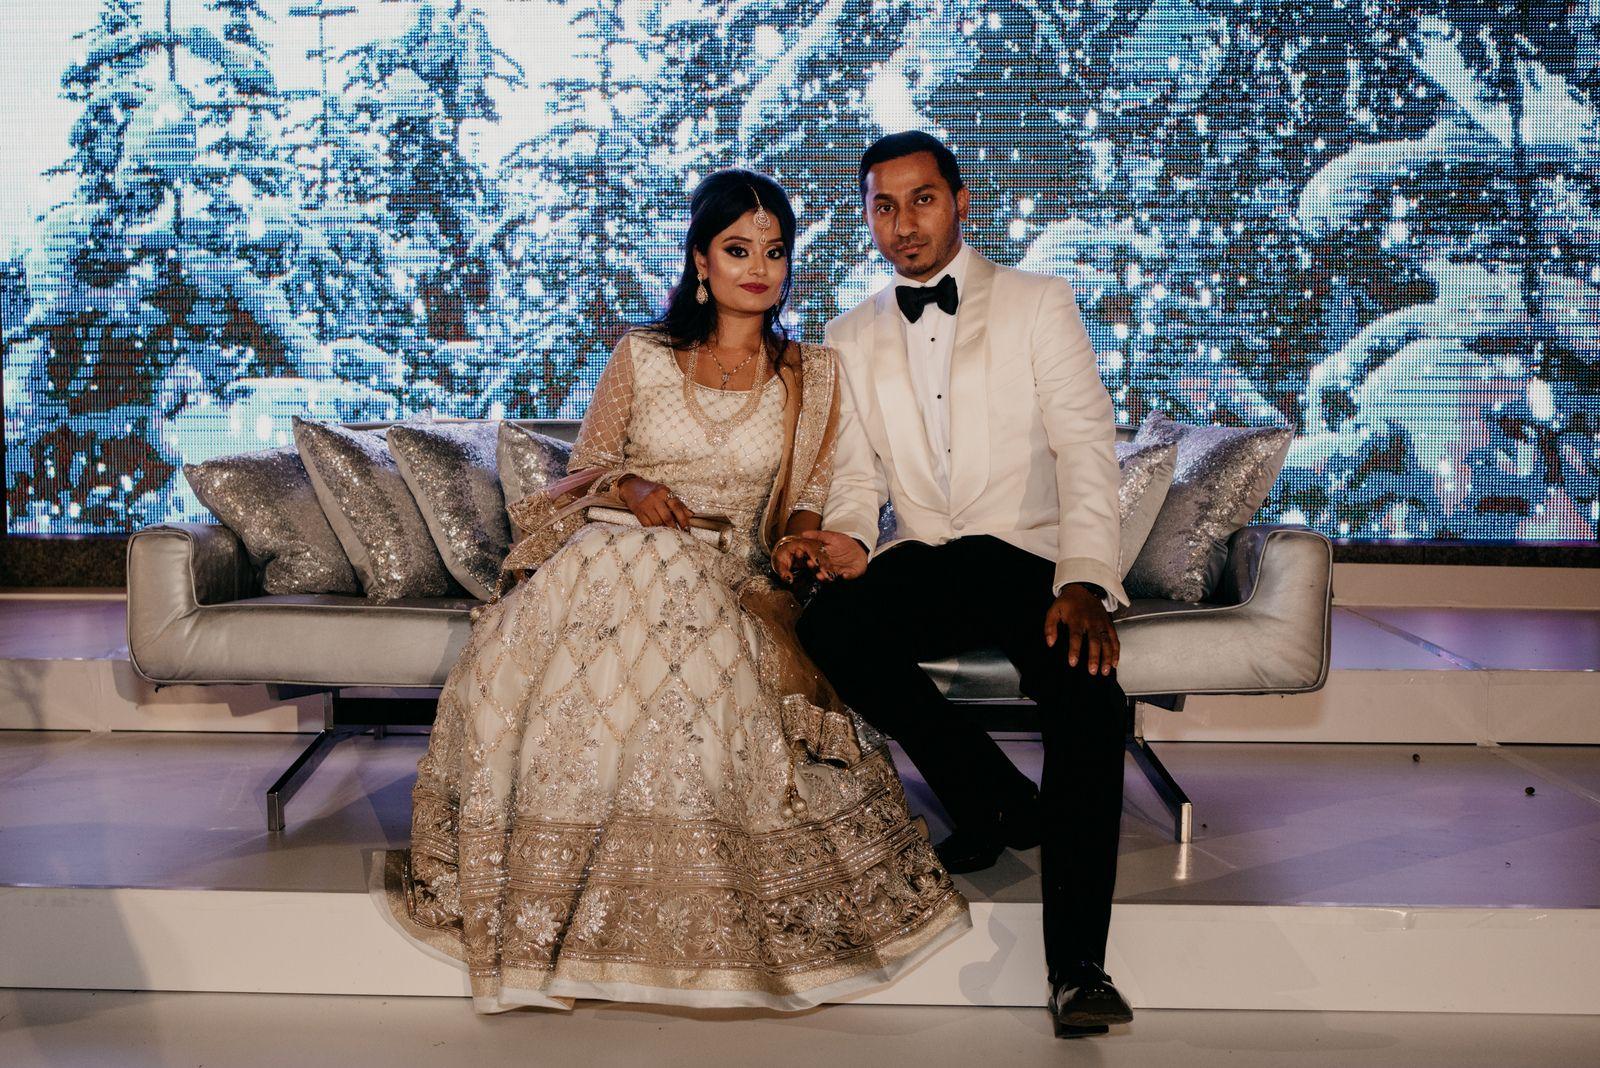 Winter Wonderland Wedding South Asian Wedding, Winter Wonderland Wedding, Wedding  Coordinator, Blue Wedding